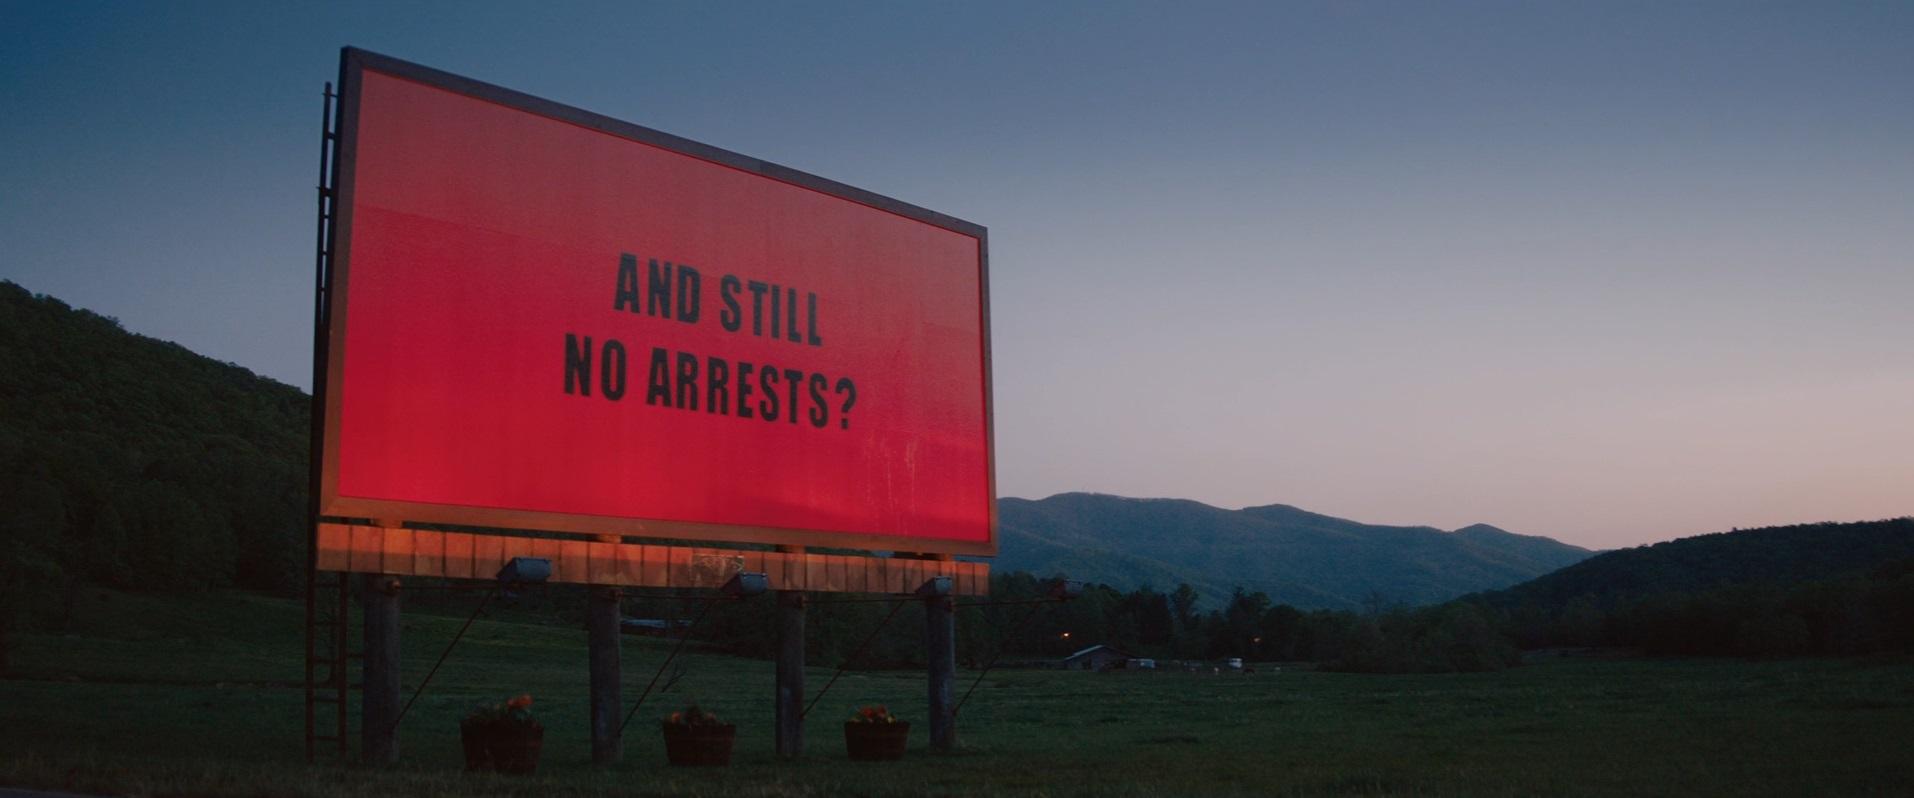 Рецензия на фильм «Три билборда на границе Эббинга, Миссури». - Изображение 4